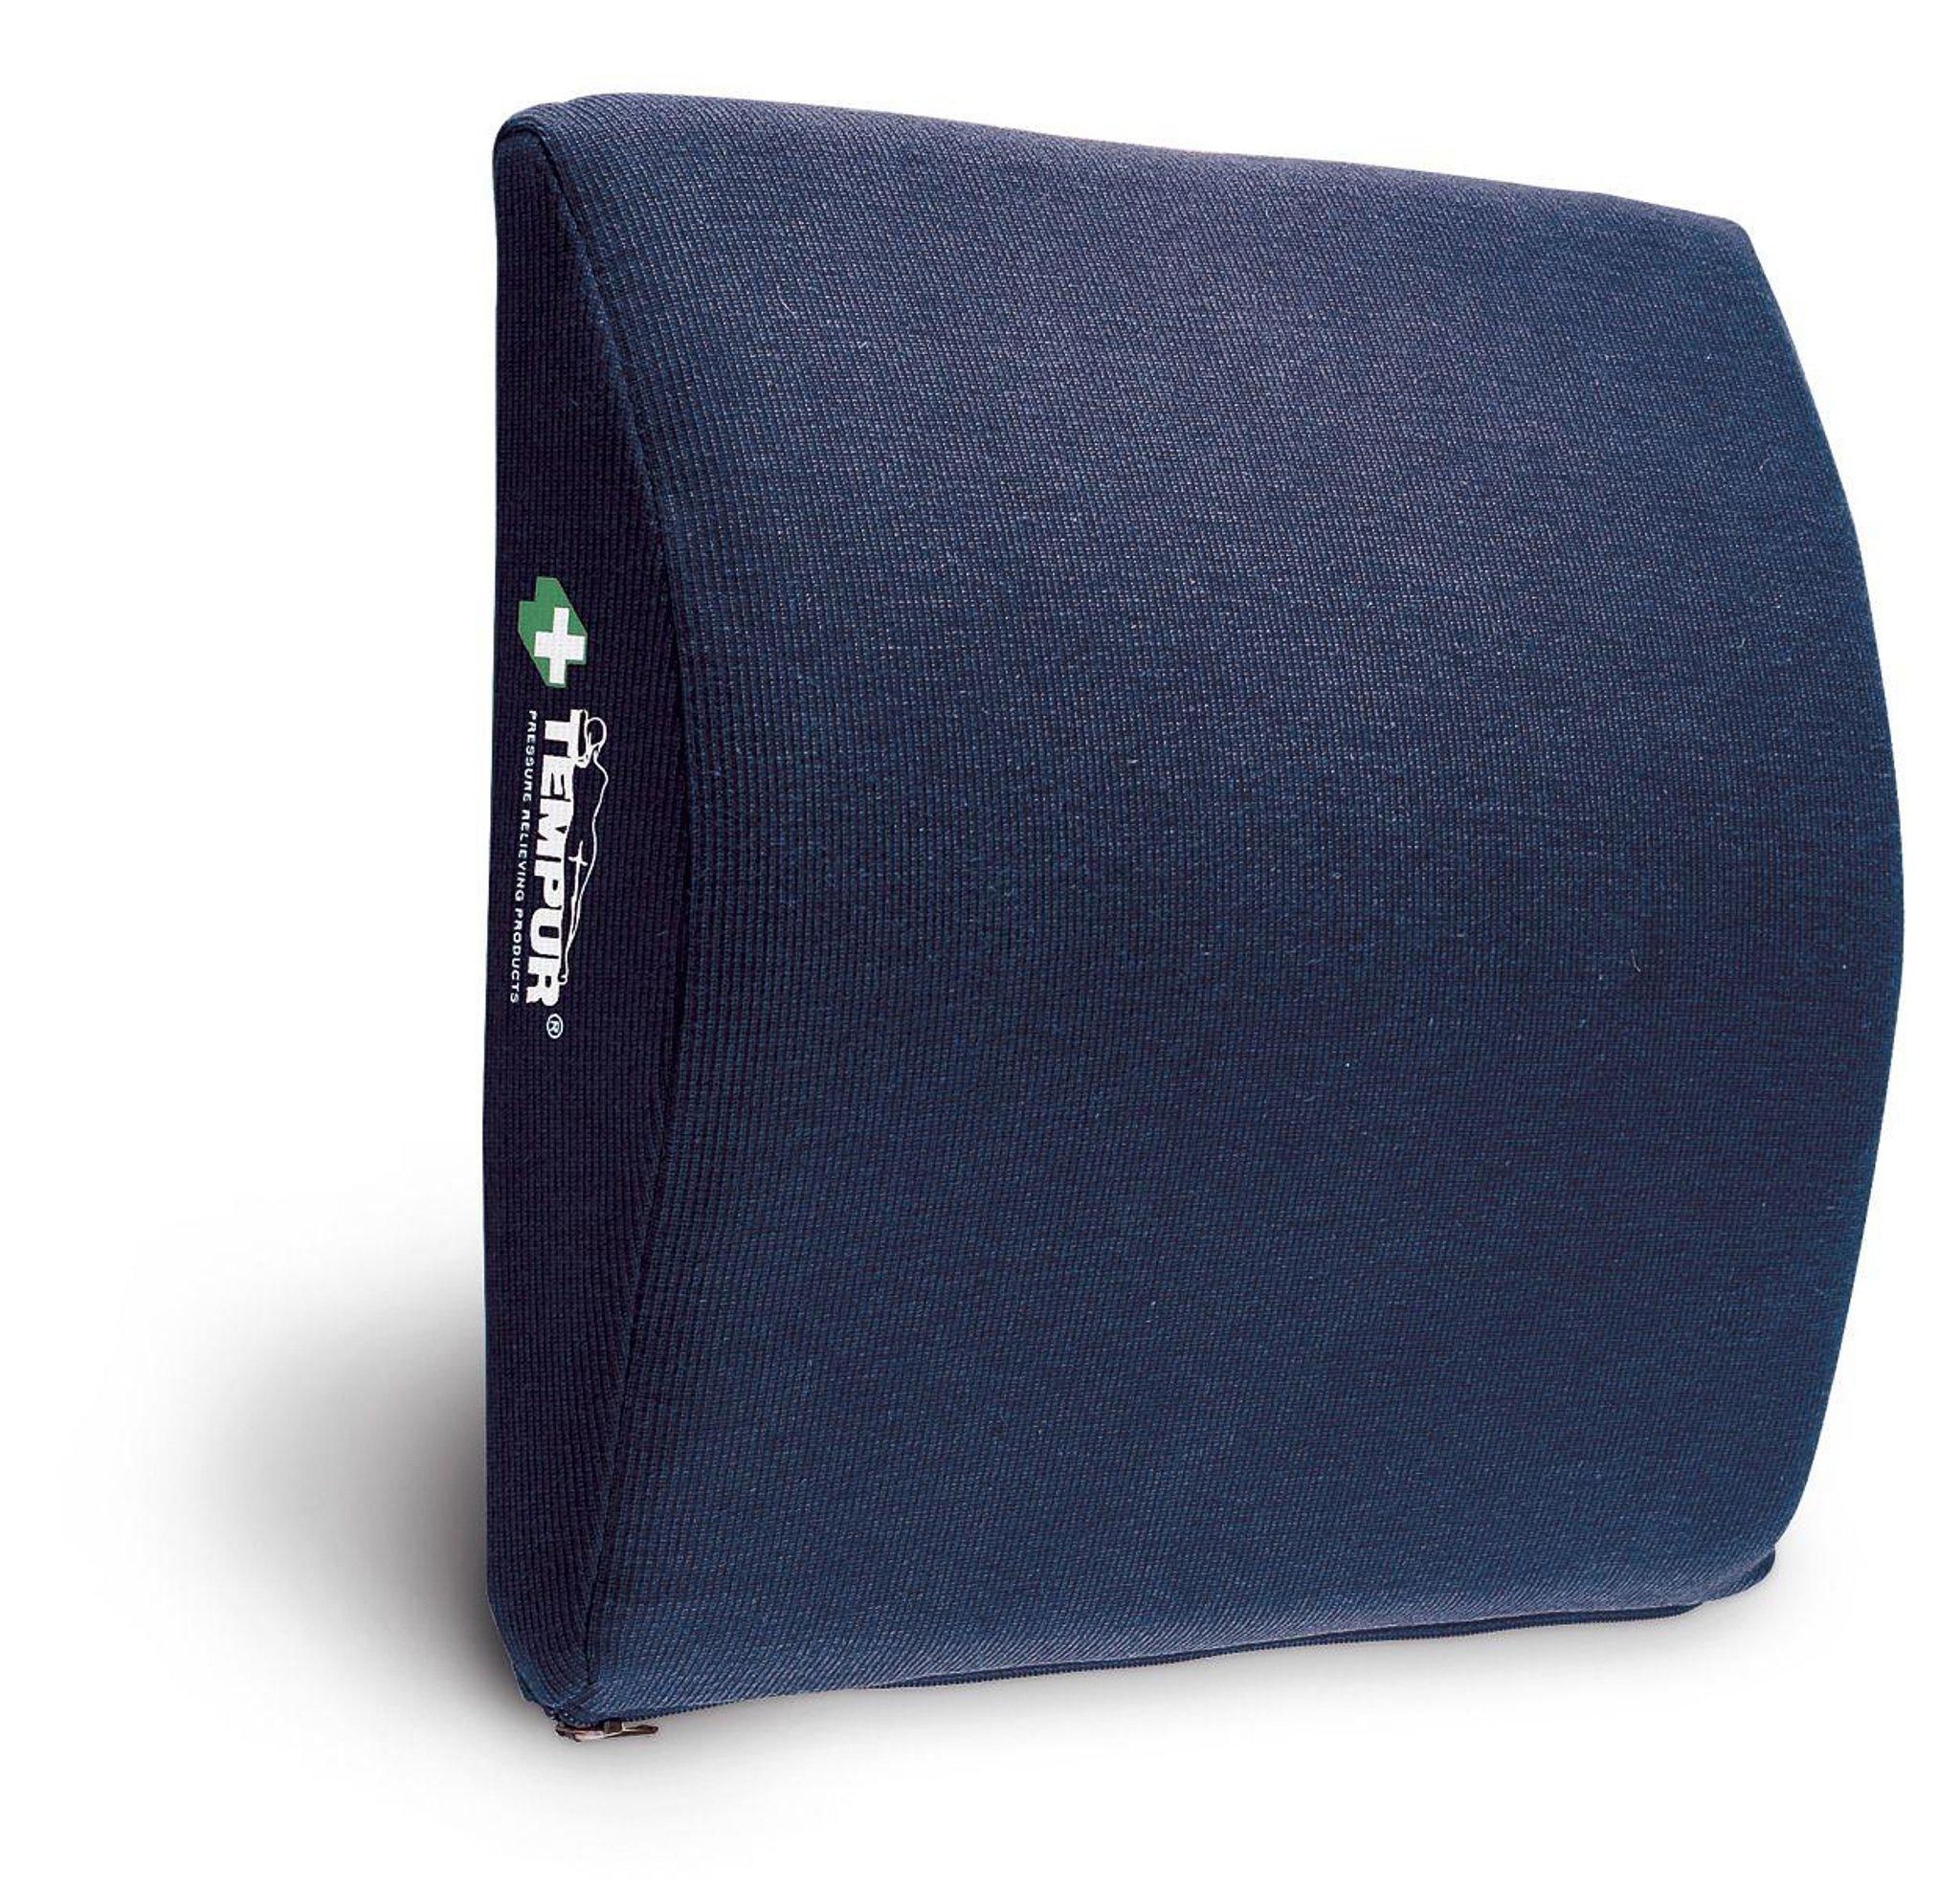 TEMPUR® Transit Lumbar Support